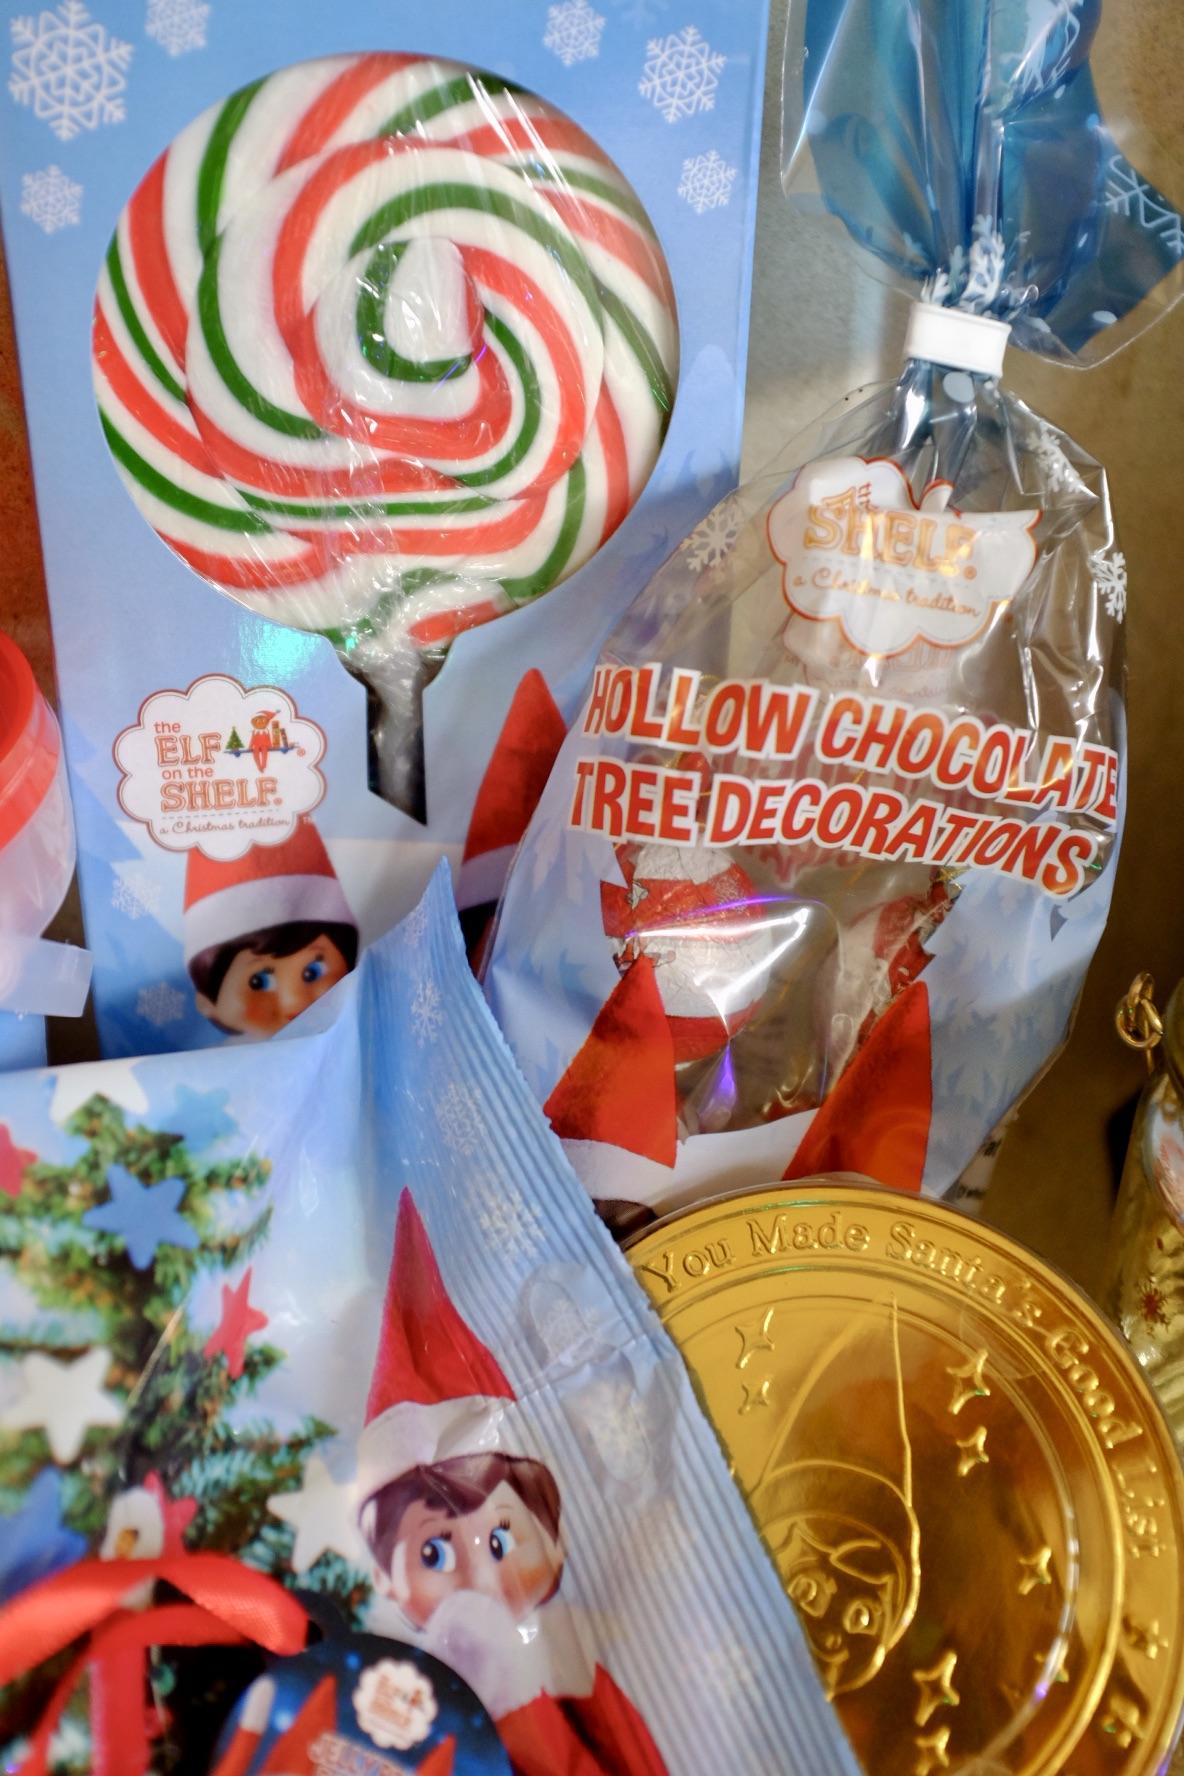 Elf on the shelf sweet treats